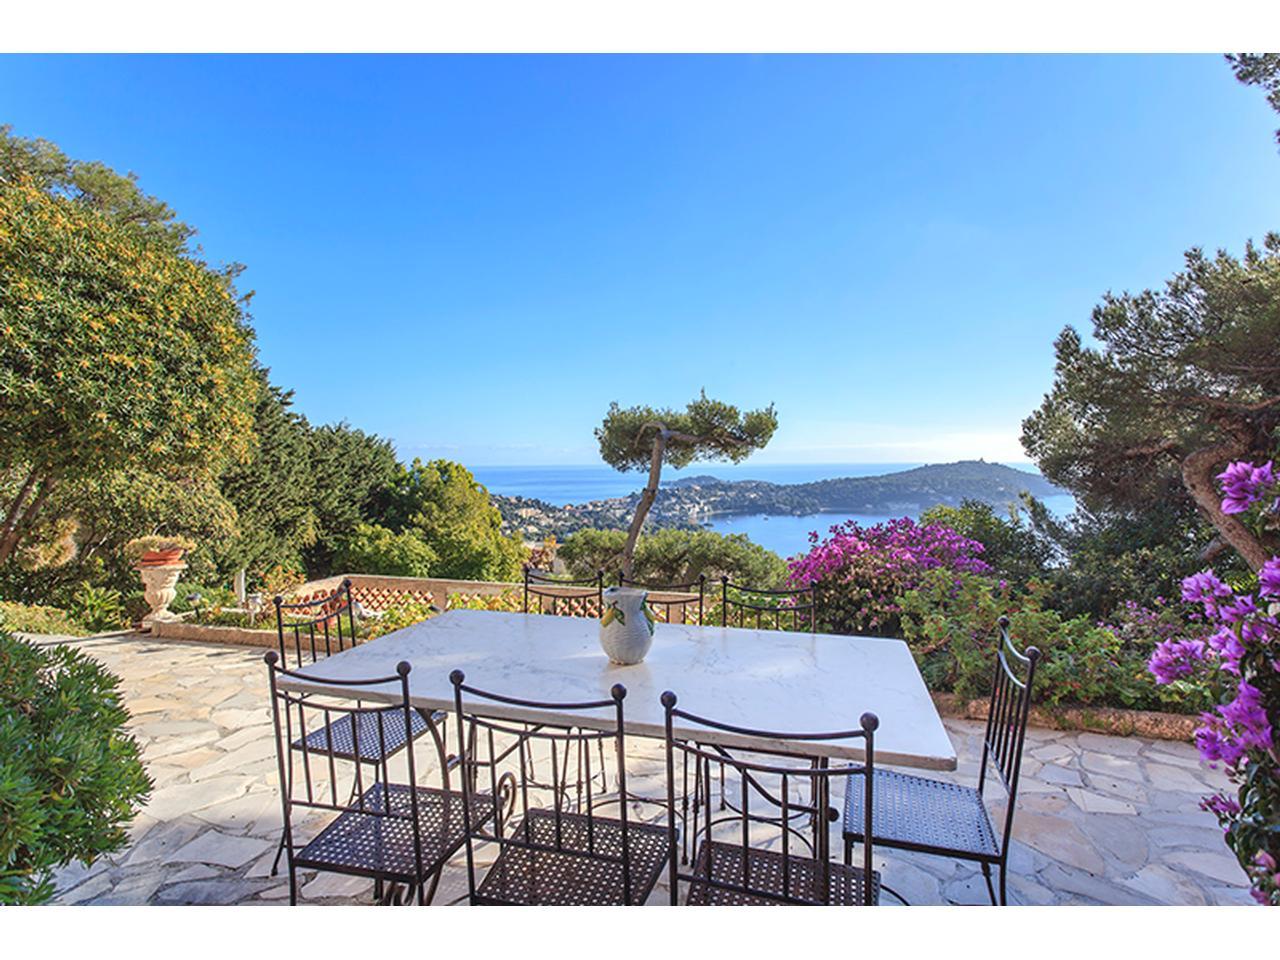 Vente appartement villefranche sur mer immobilier nice vue for Jardin immobilier